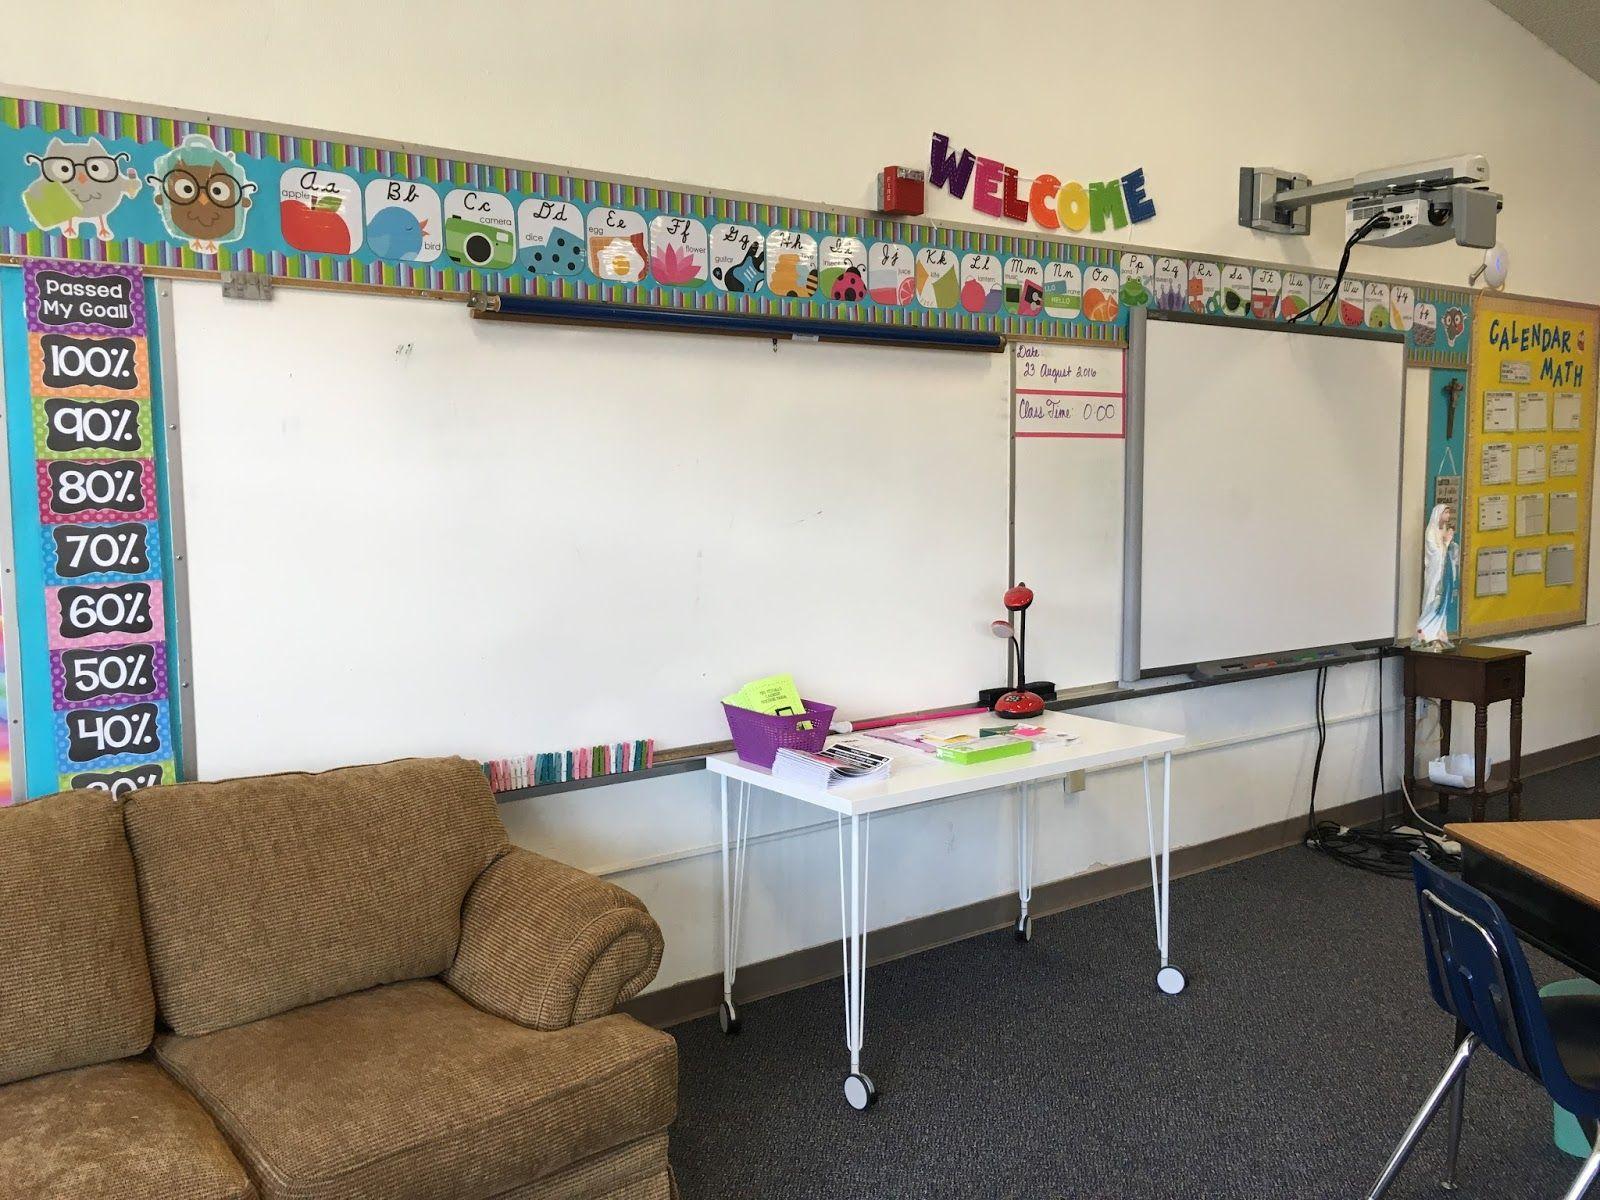 5Th Grade Classroom Set Up, Classroom Decoration, Bulletin Board Ideas,